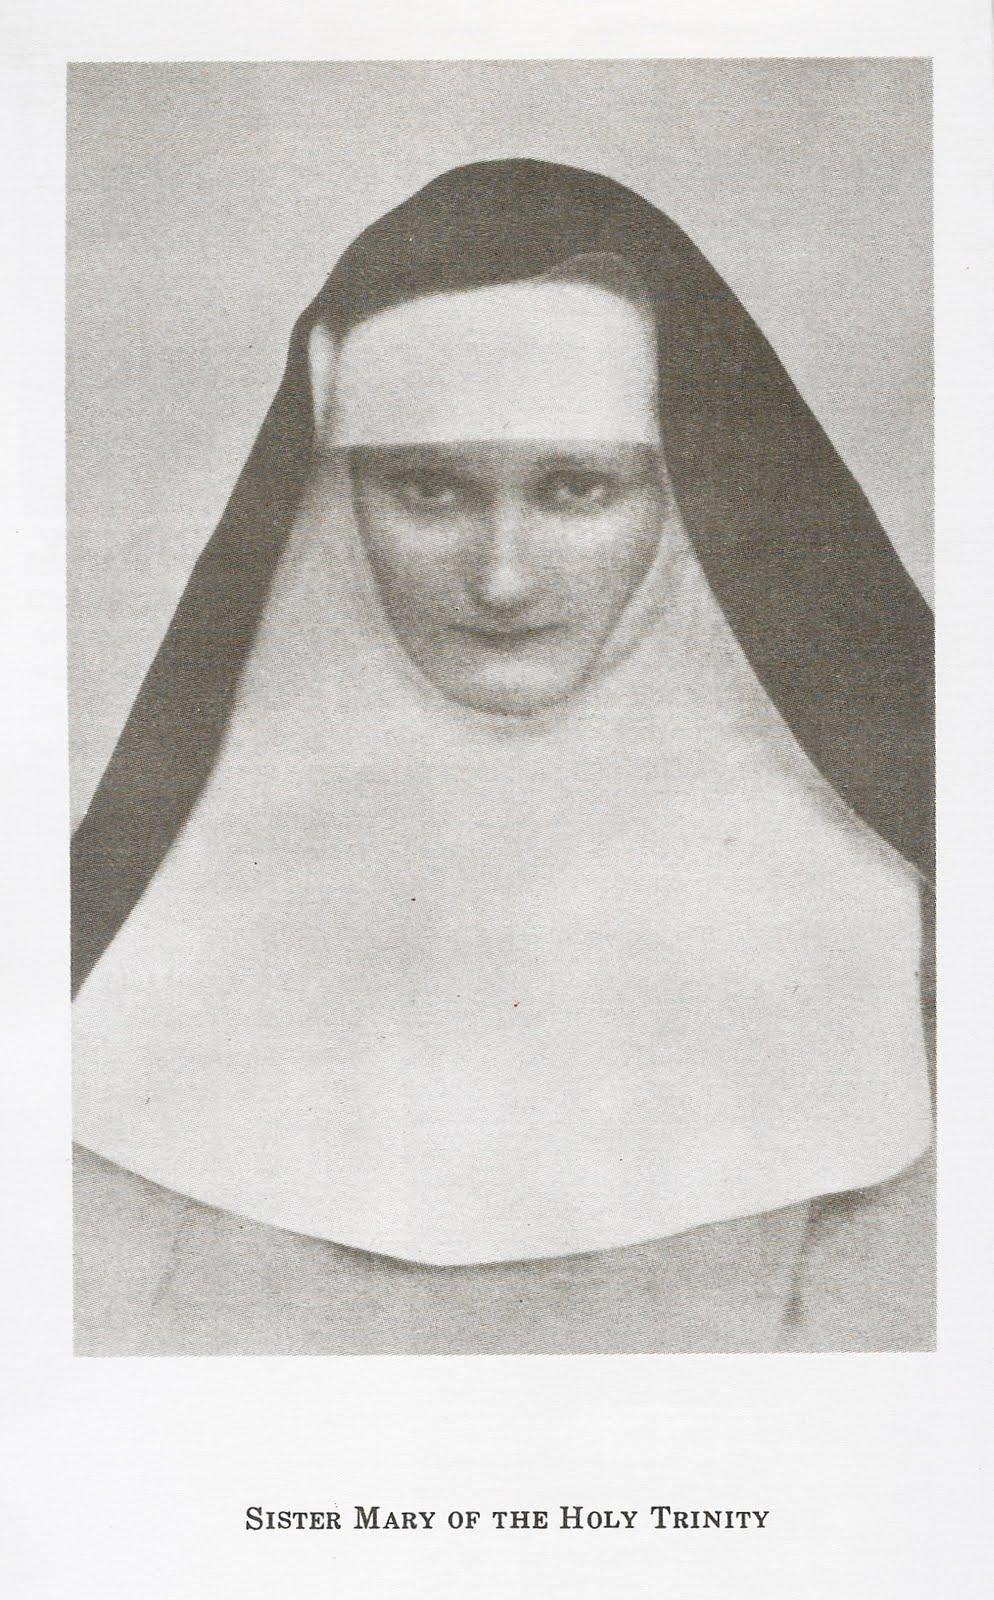 Louisa Jaques